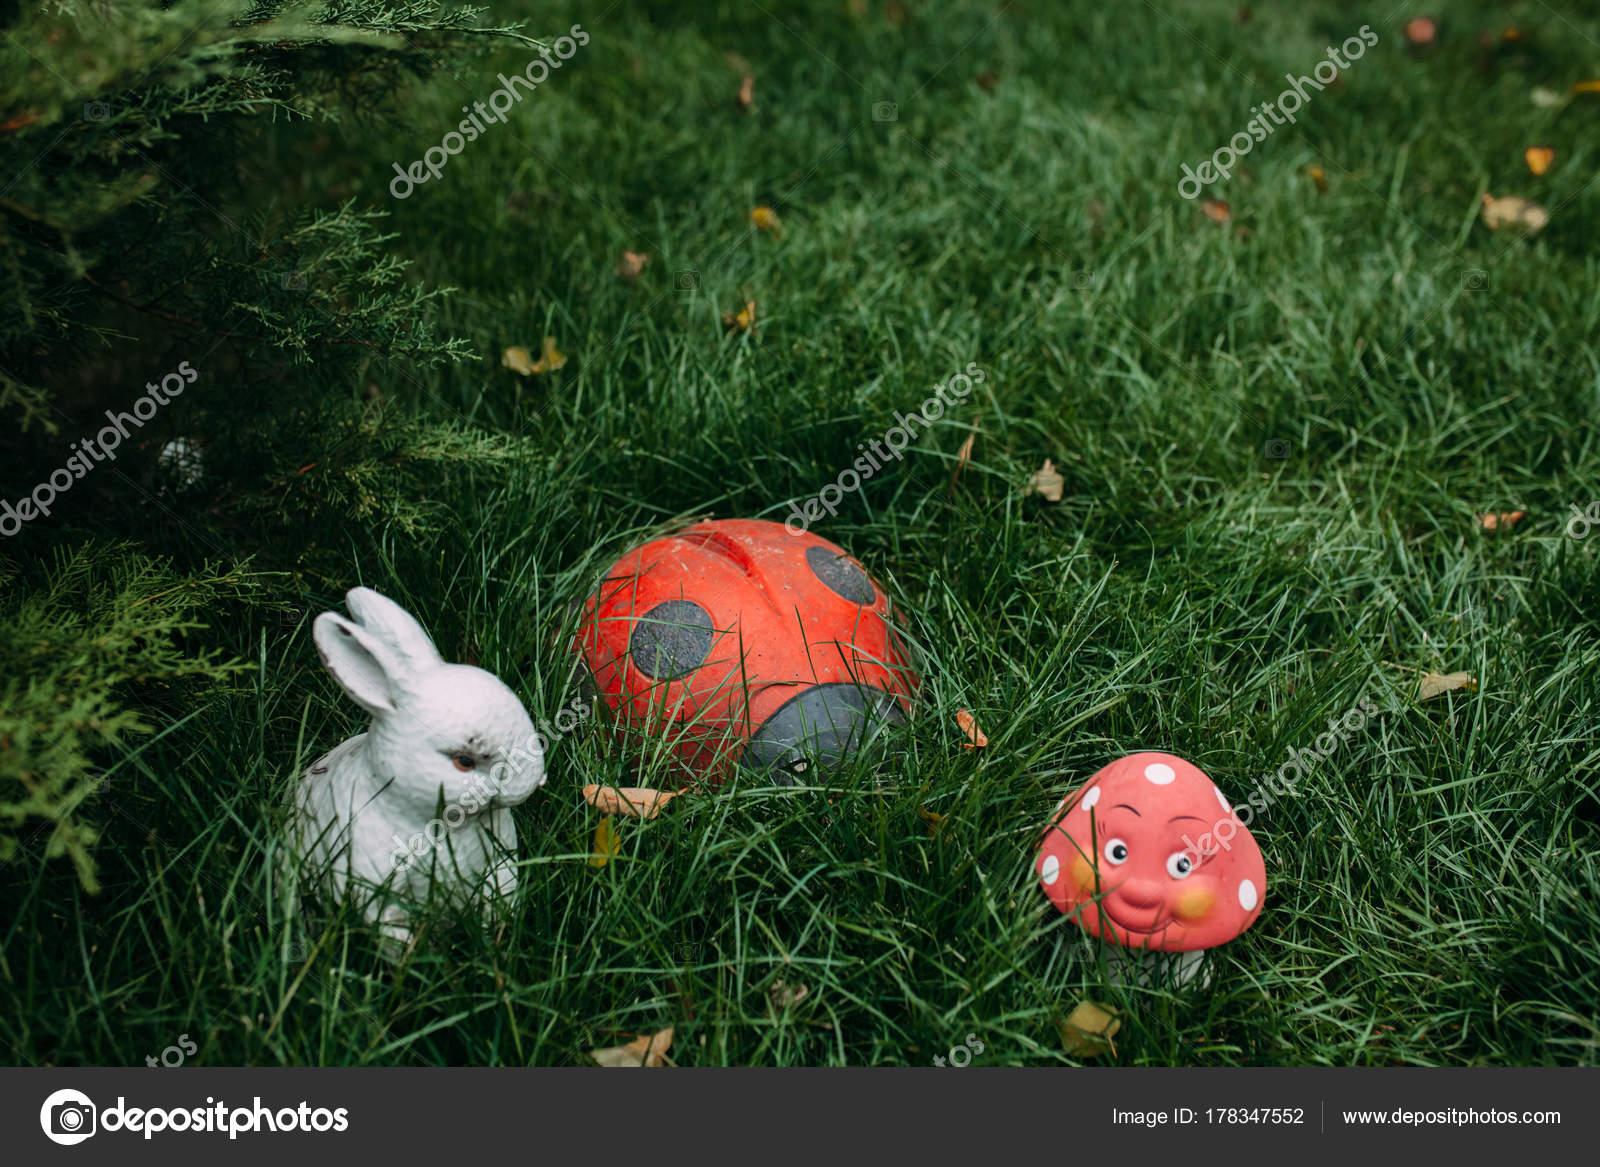 Decorations Garden Scenery Garden — Stock Photo © Marushy99 #178347552